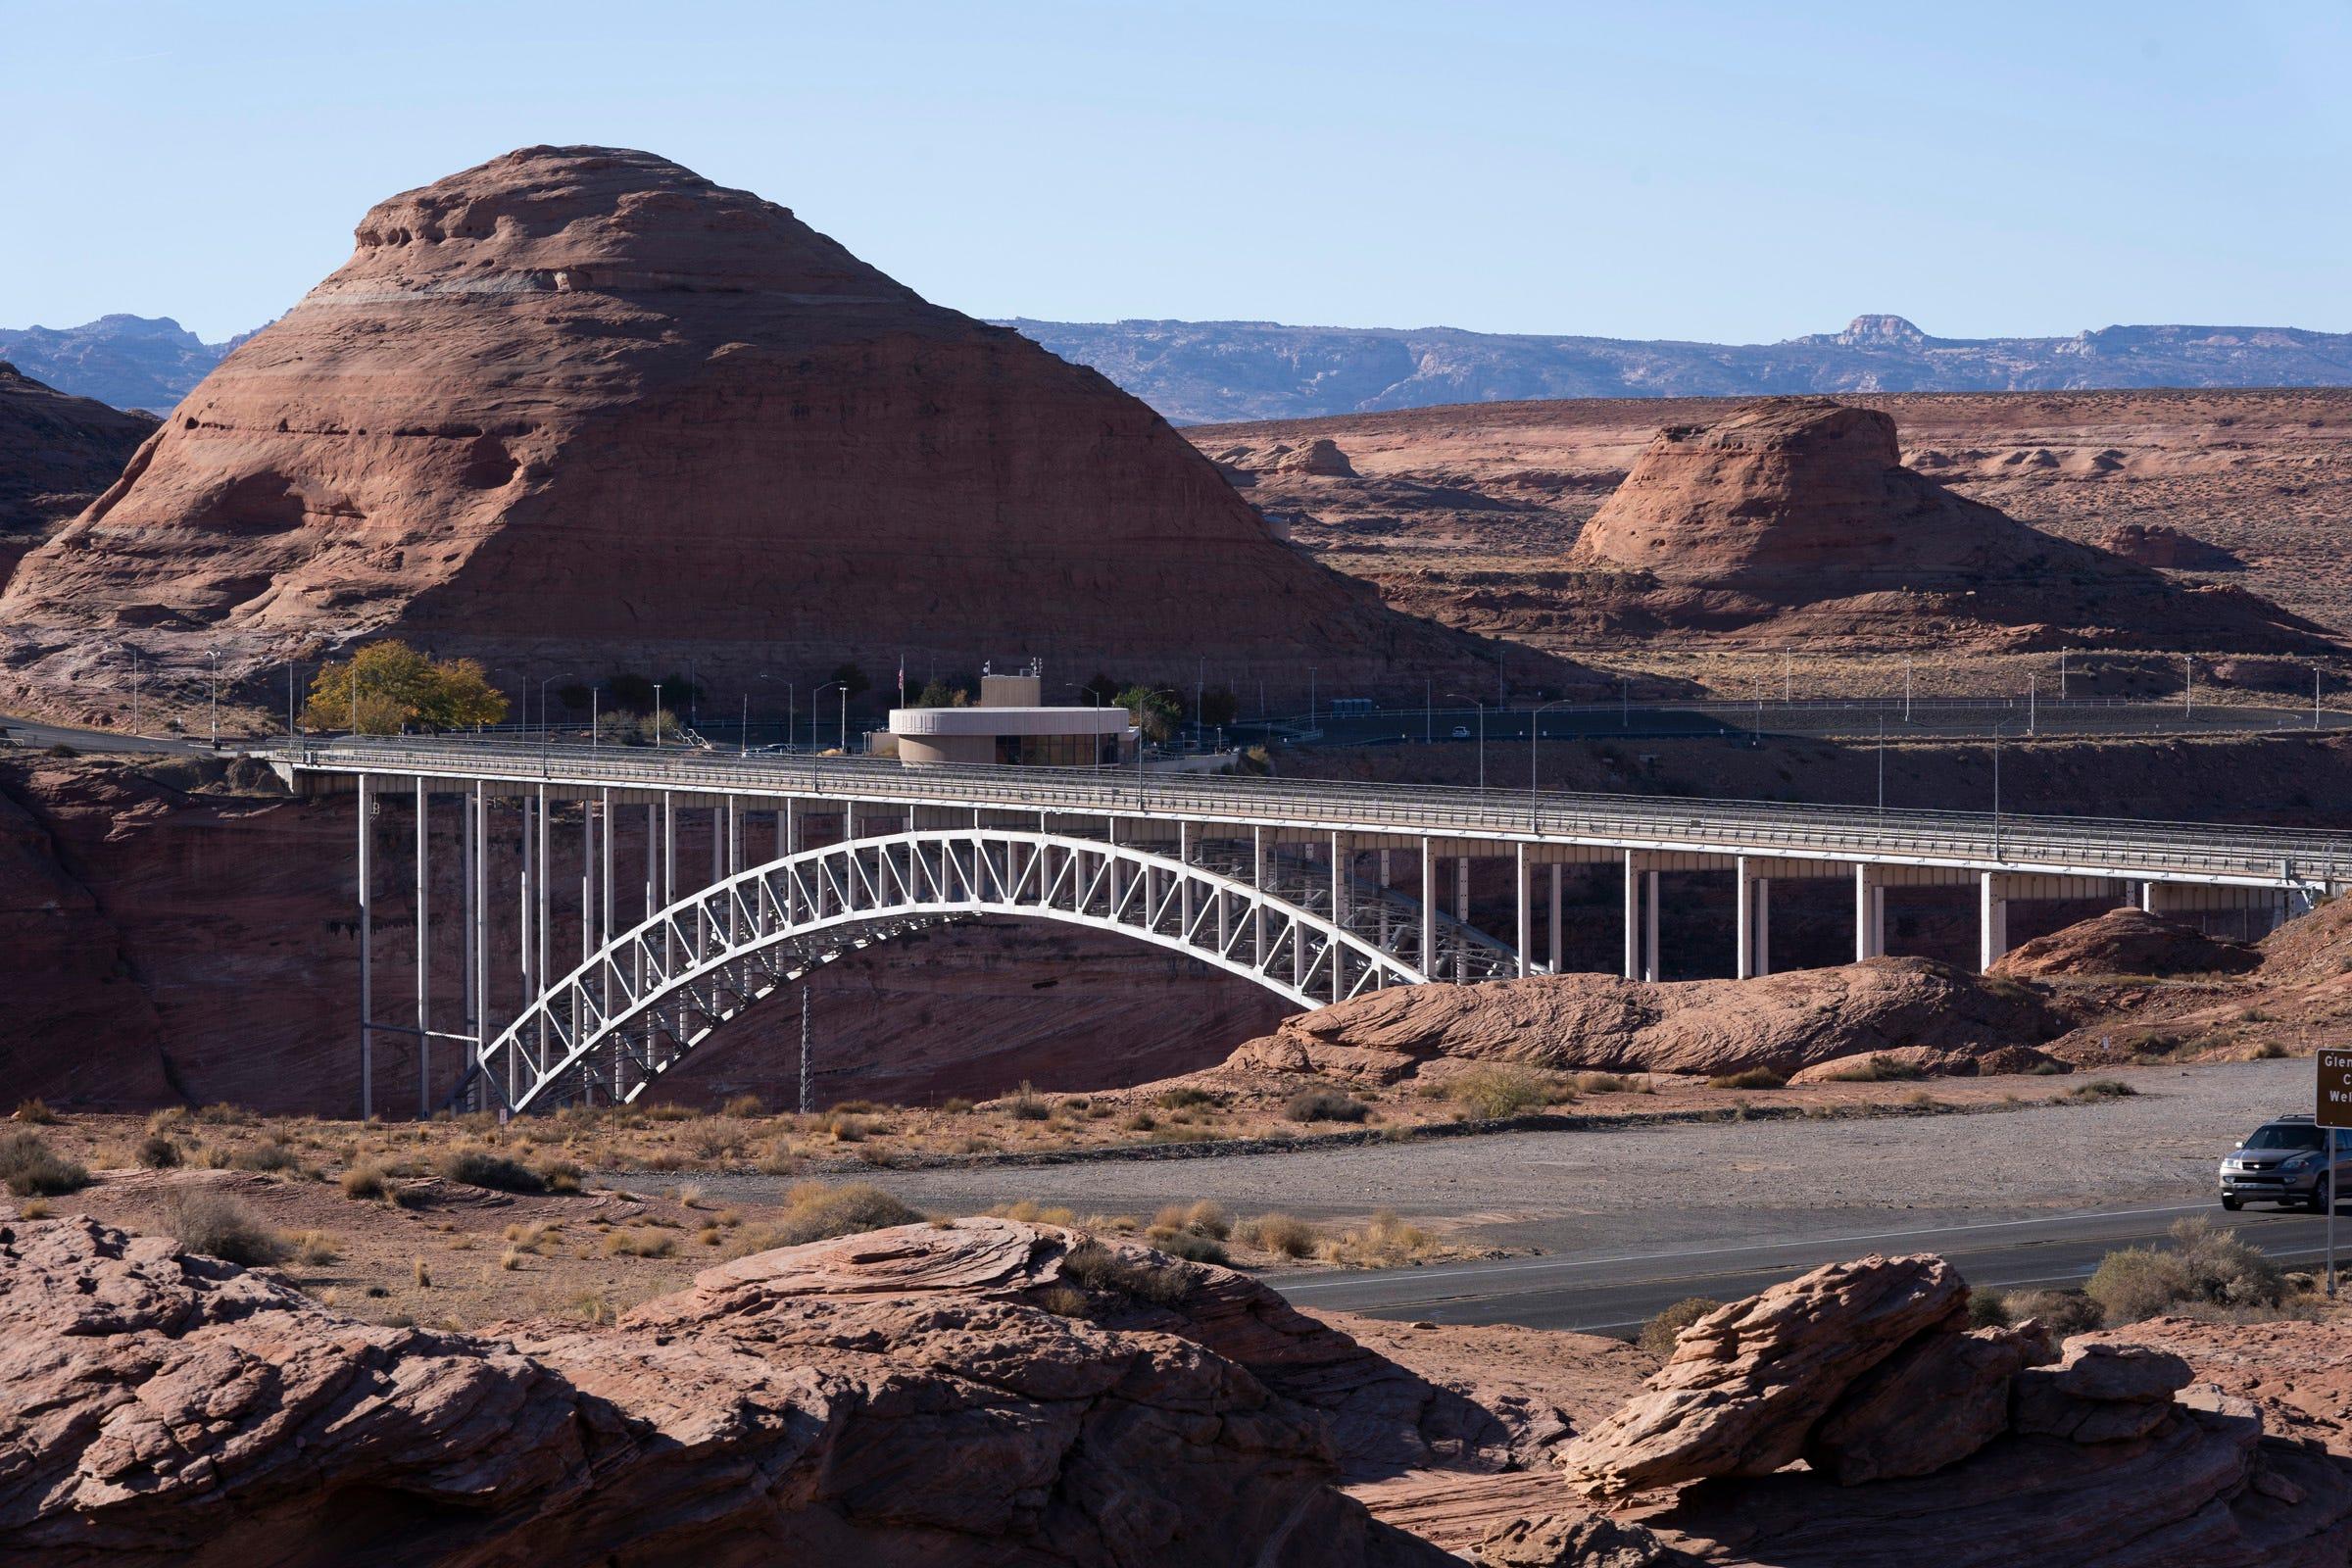 Glen Canyon Bridge crosses the Colorado River next to Glen Canyon Dam and Lake Powell.